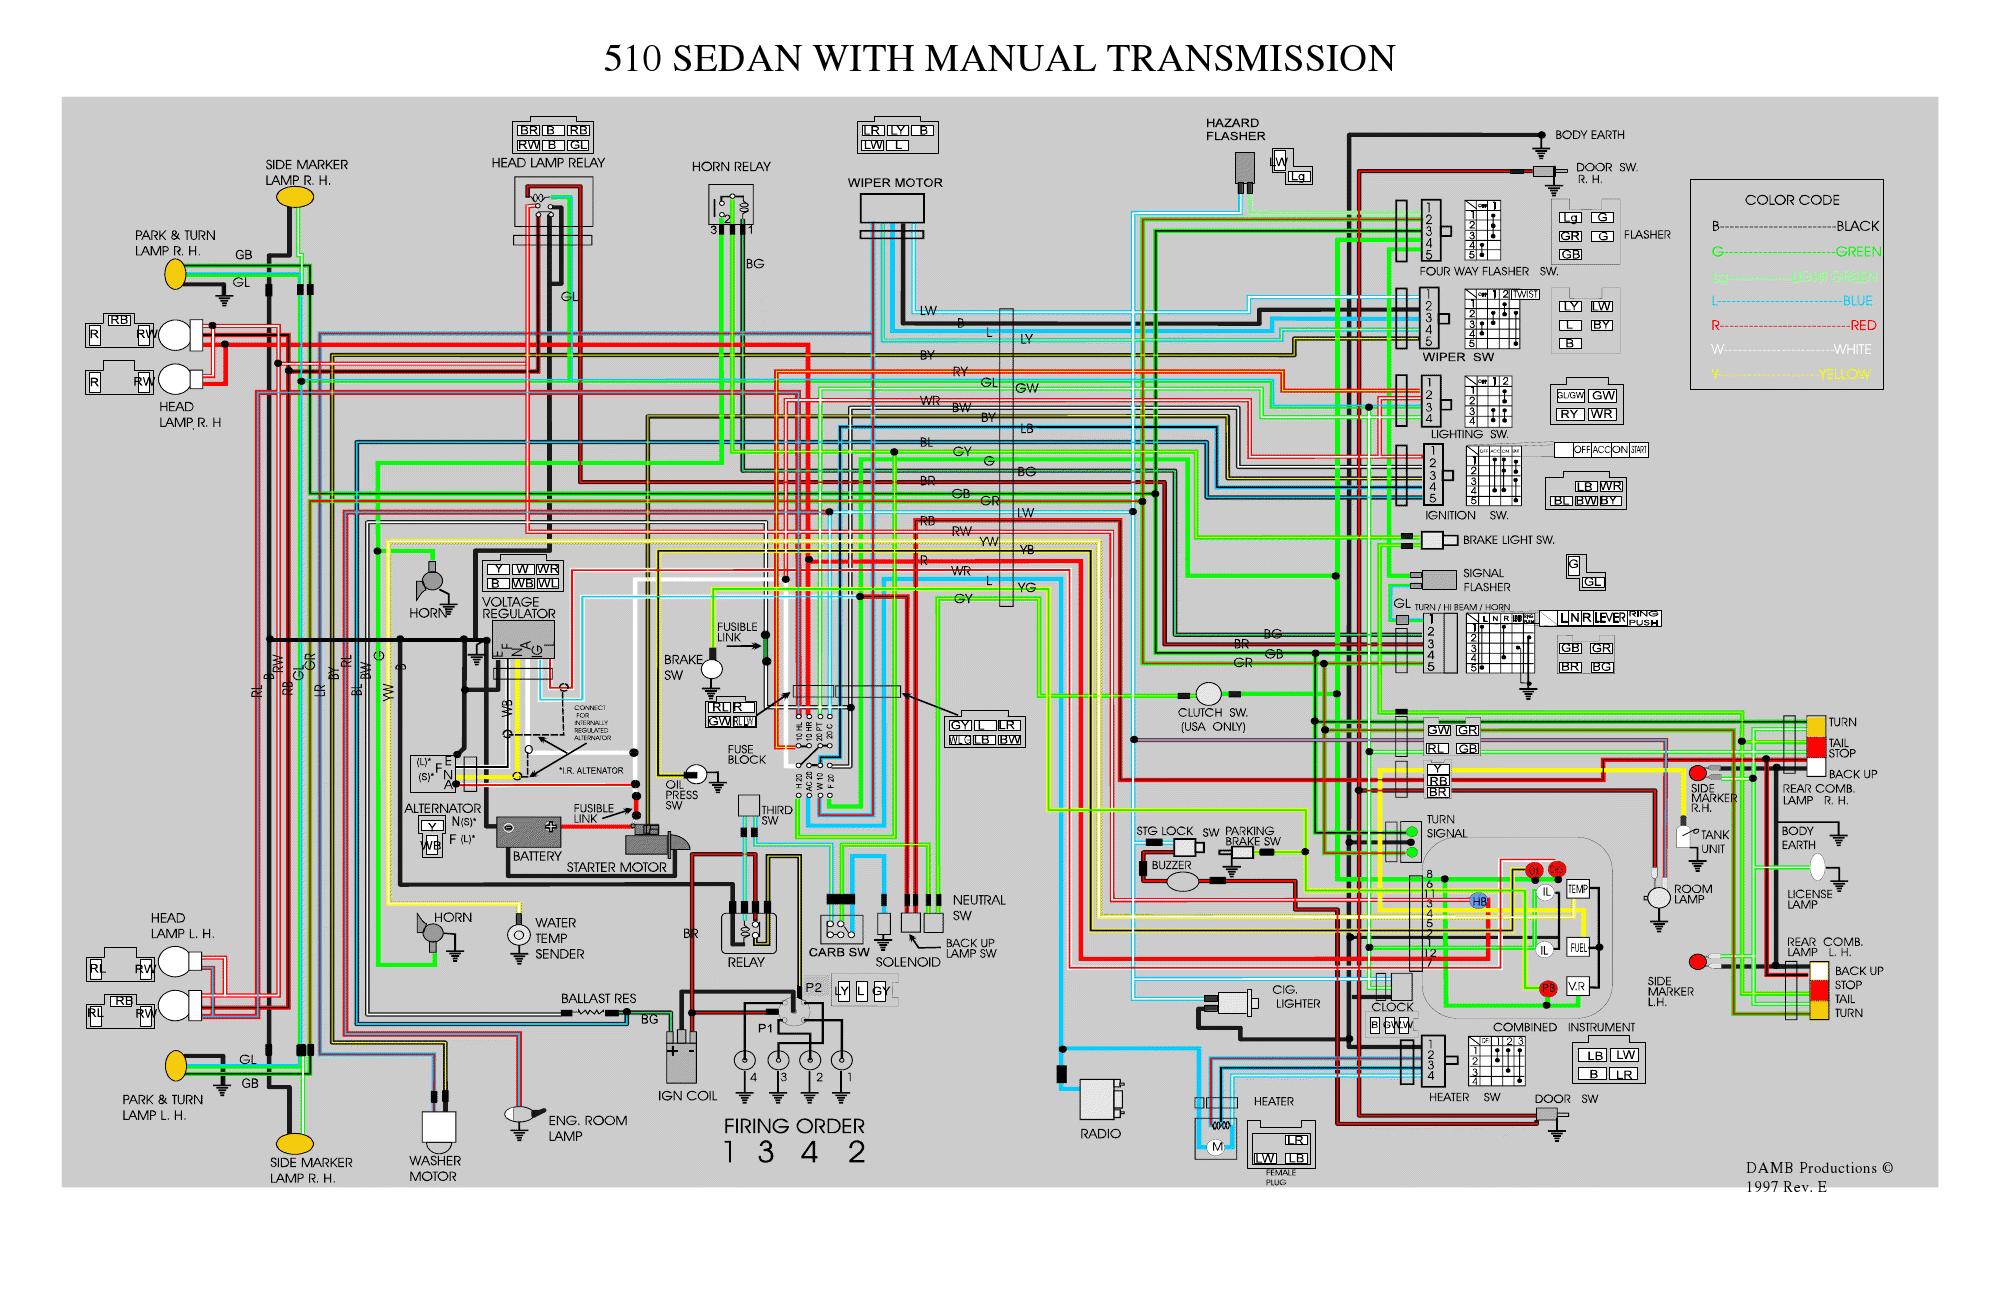 datsun_510_wiring_diagram?resize=665%2C430 diagrams 642700 ez wiring harness diagram ez wiring harness ez wiring harness scout ii at webbmarketing.co